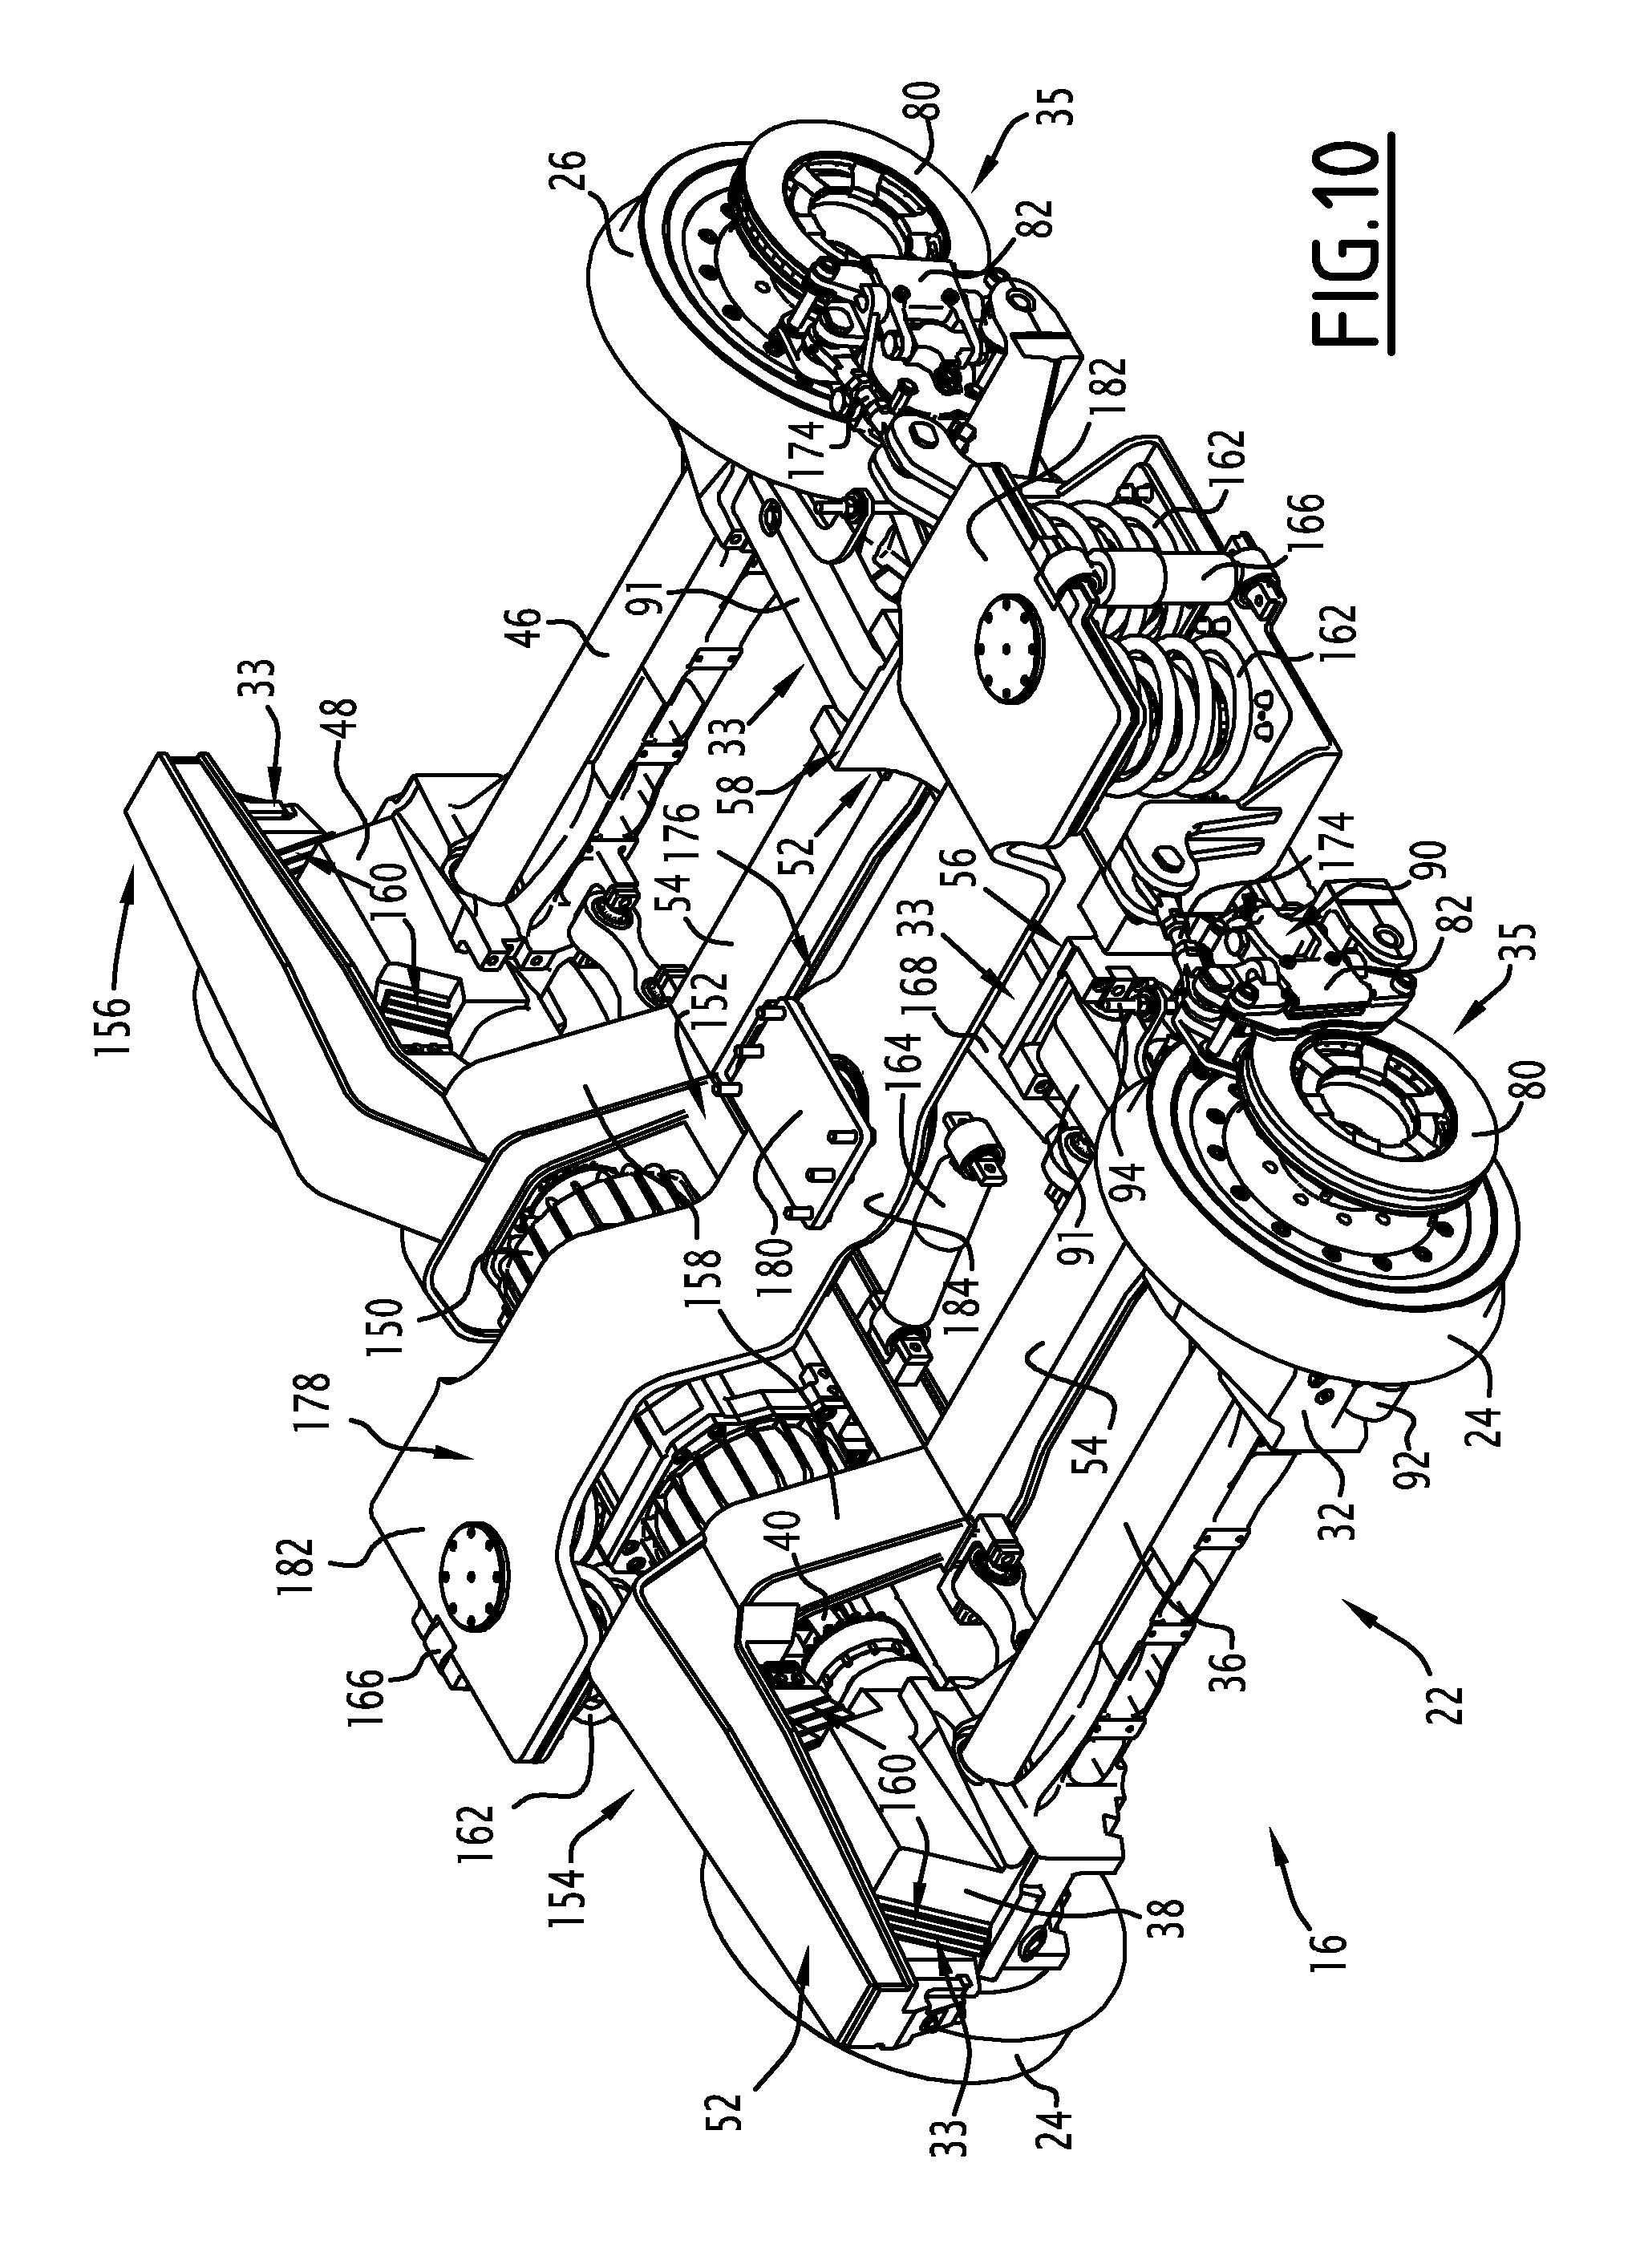 Patent Us20100132585 Railway Vehicle Comprising Pivoting Bogies Honda Cbr1000f Wiring Drawing